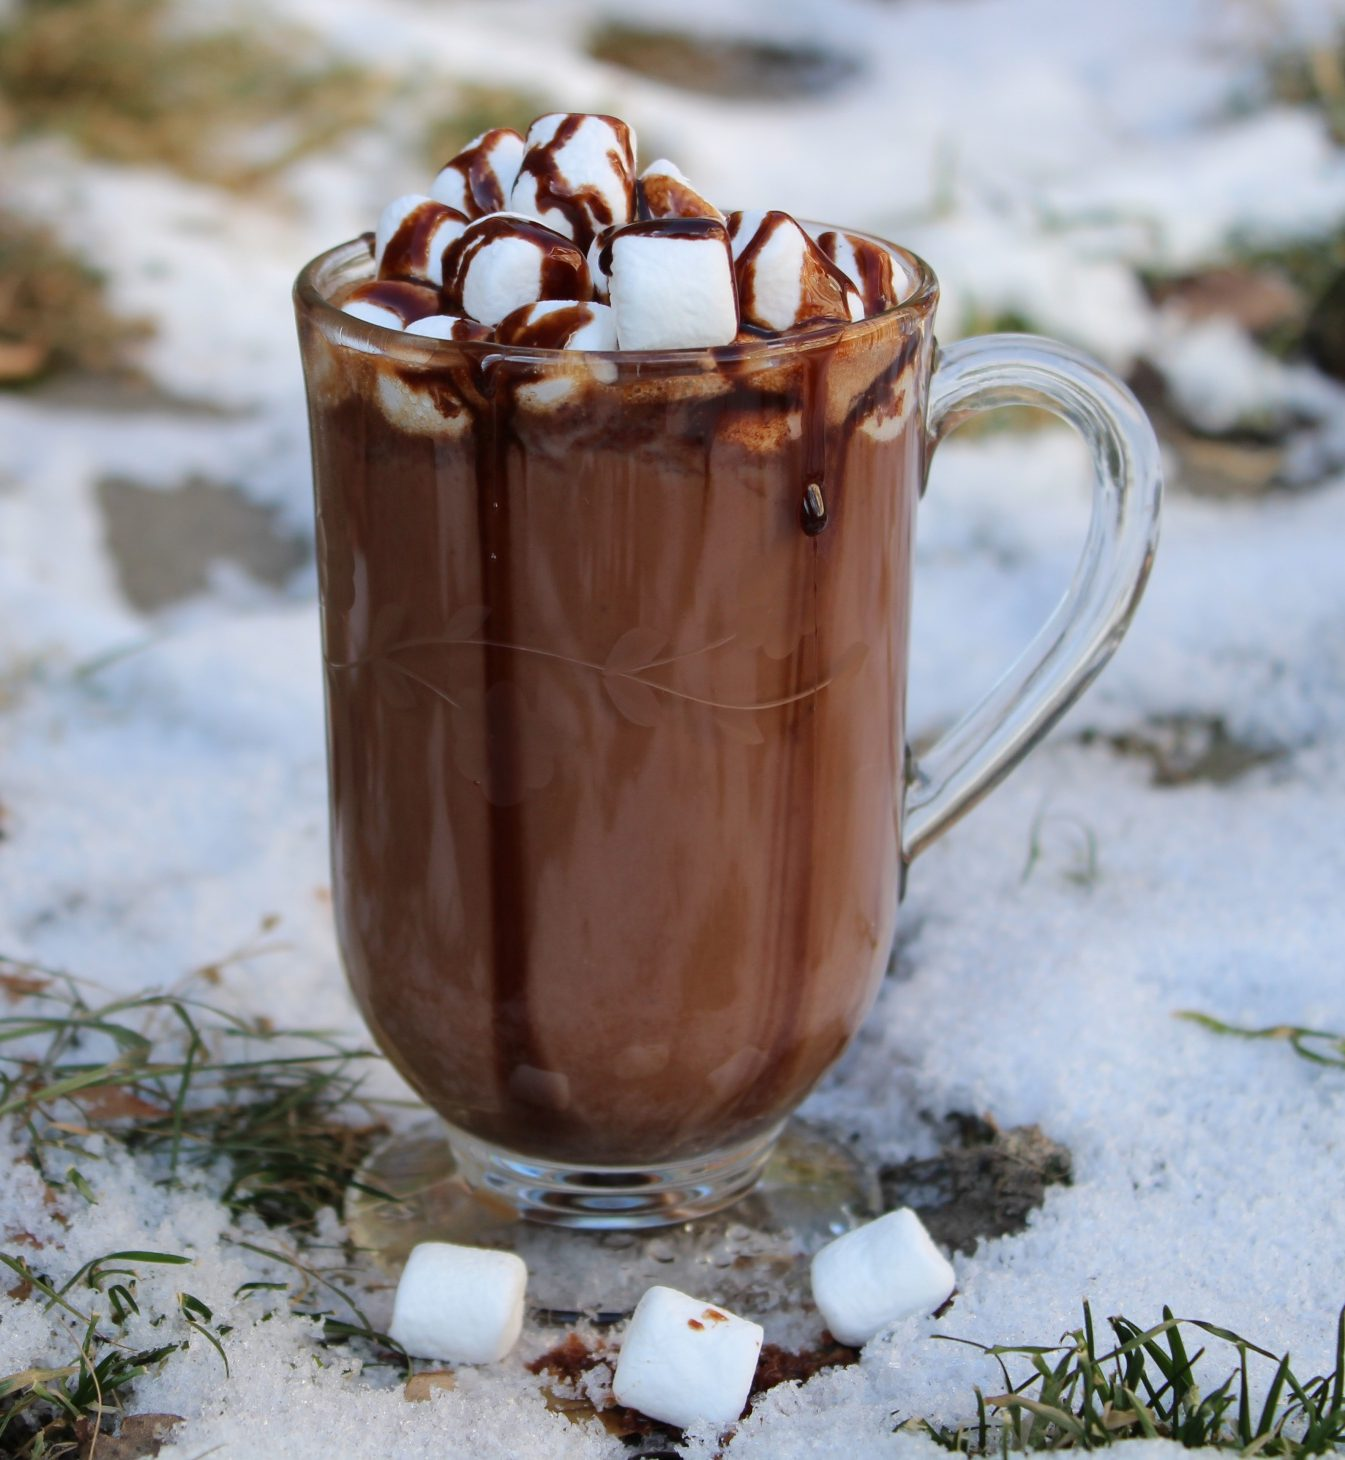 HERSHEY/'S S/'MORES THE MERRIER  HOT CHOCOLATE MUG NICE